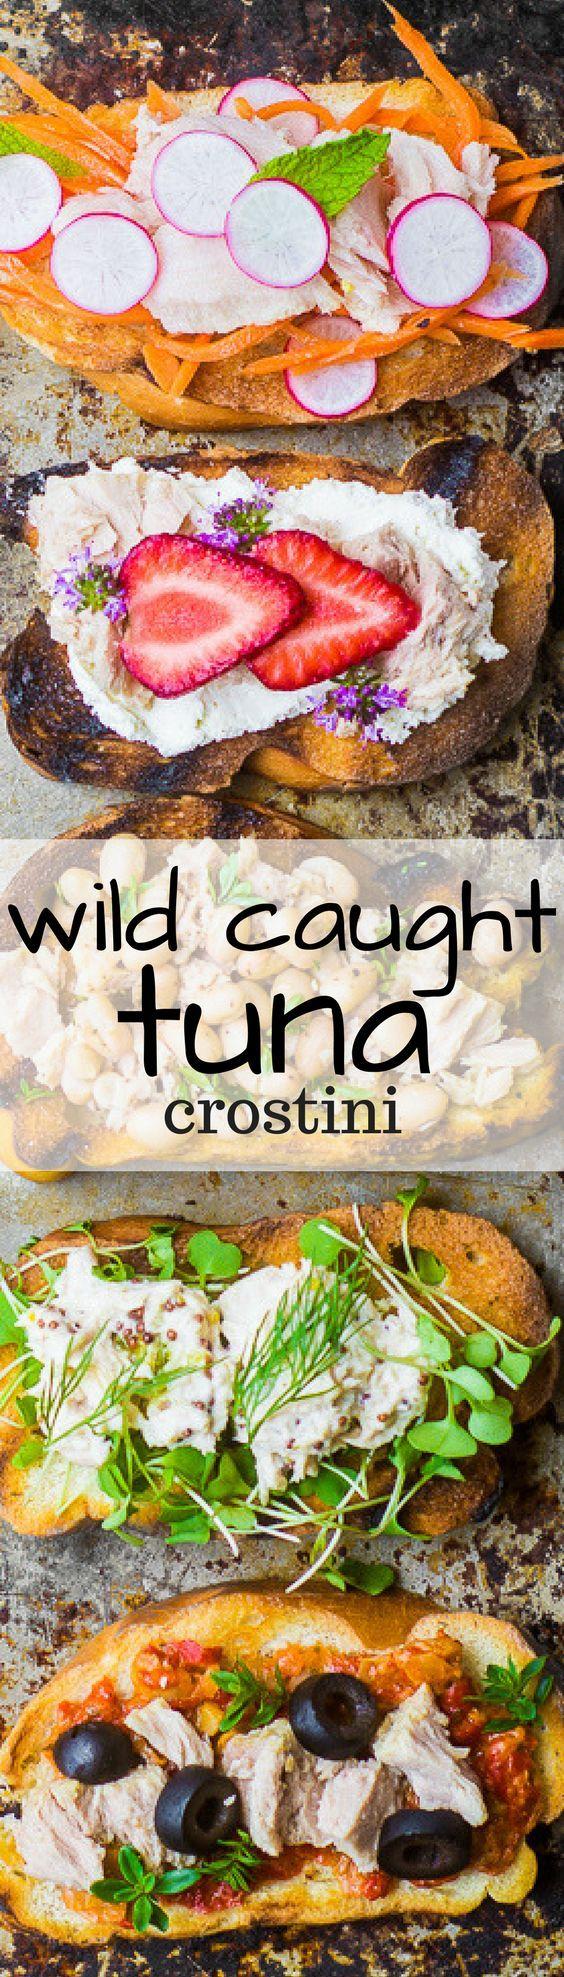 Wild Caught Tuna Crostini | The View from Great Island